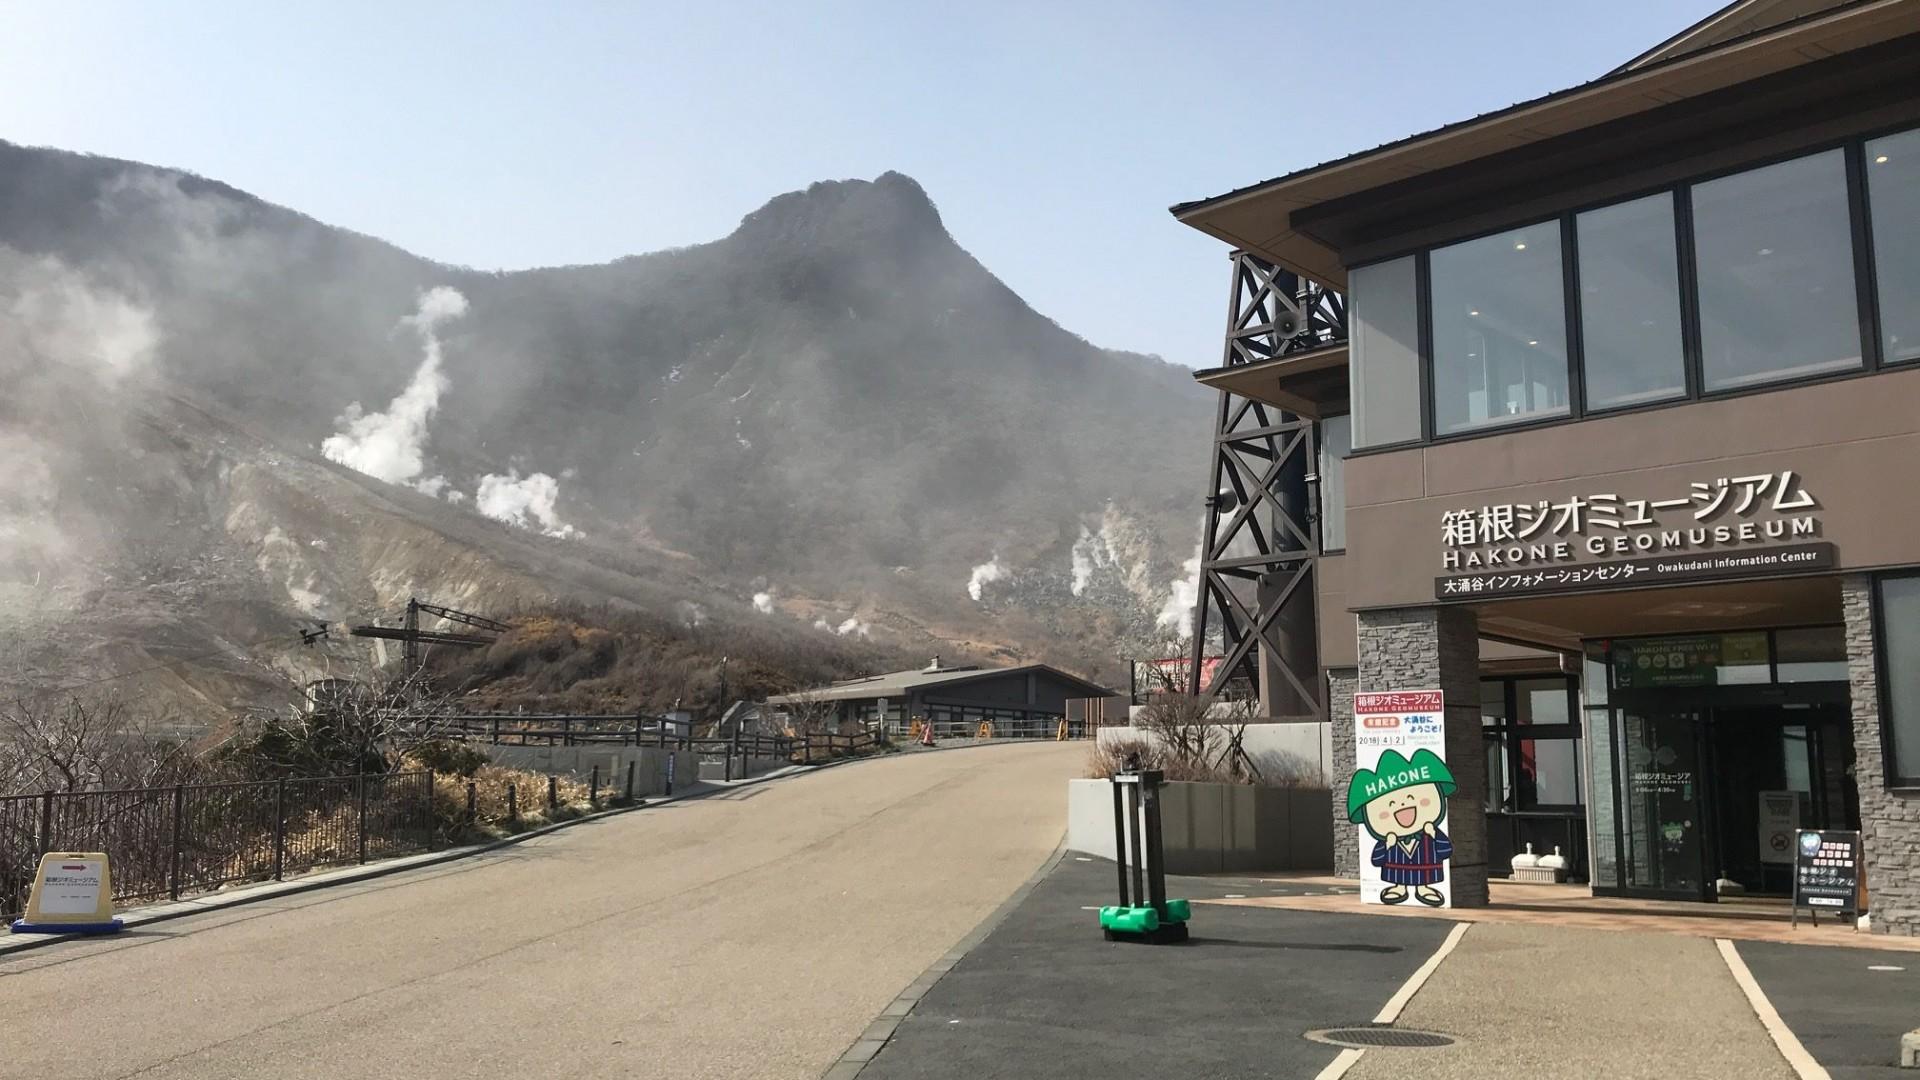 Hakone Geomuseum